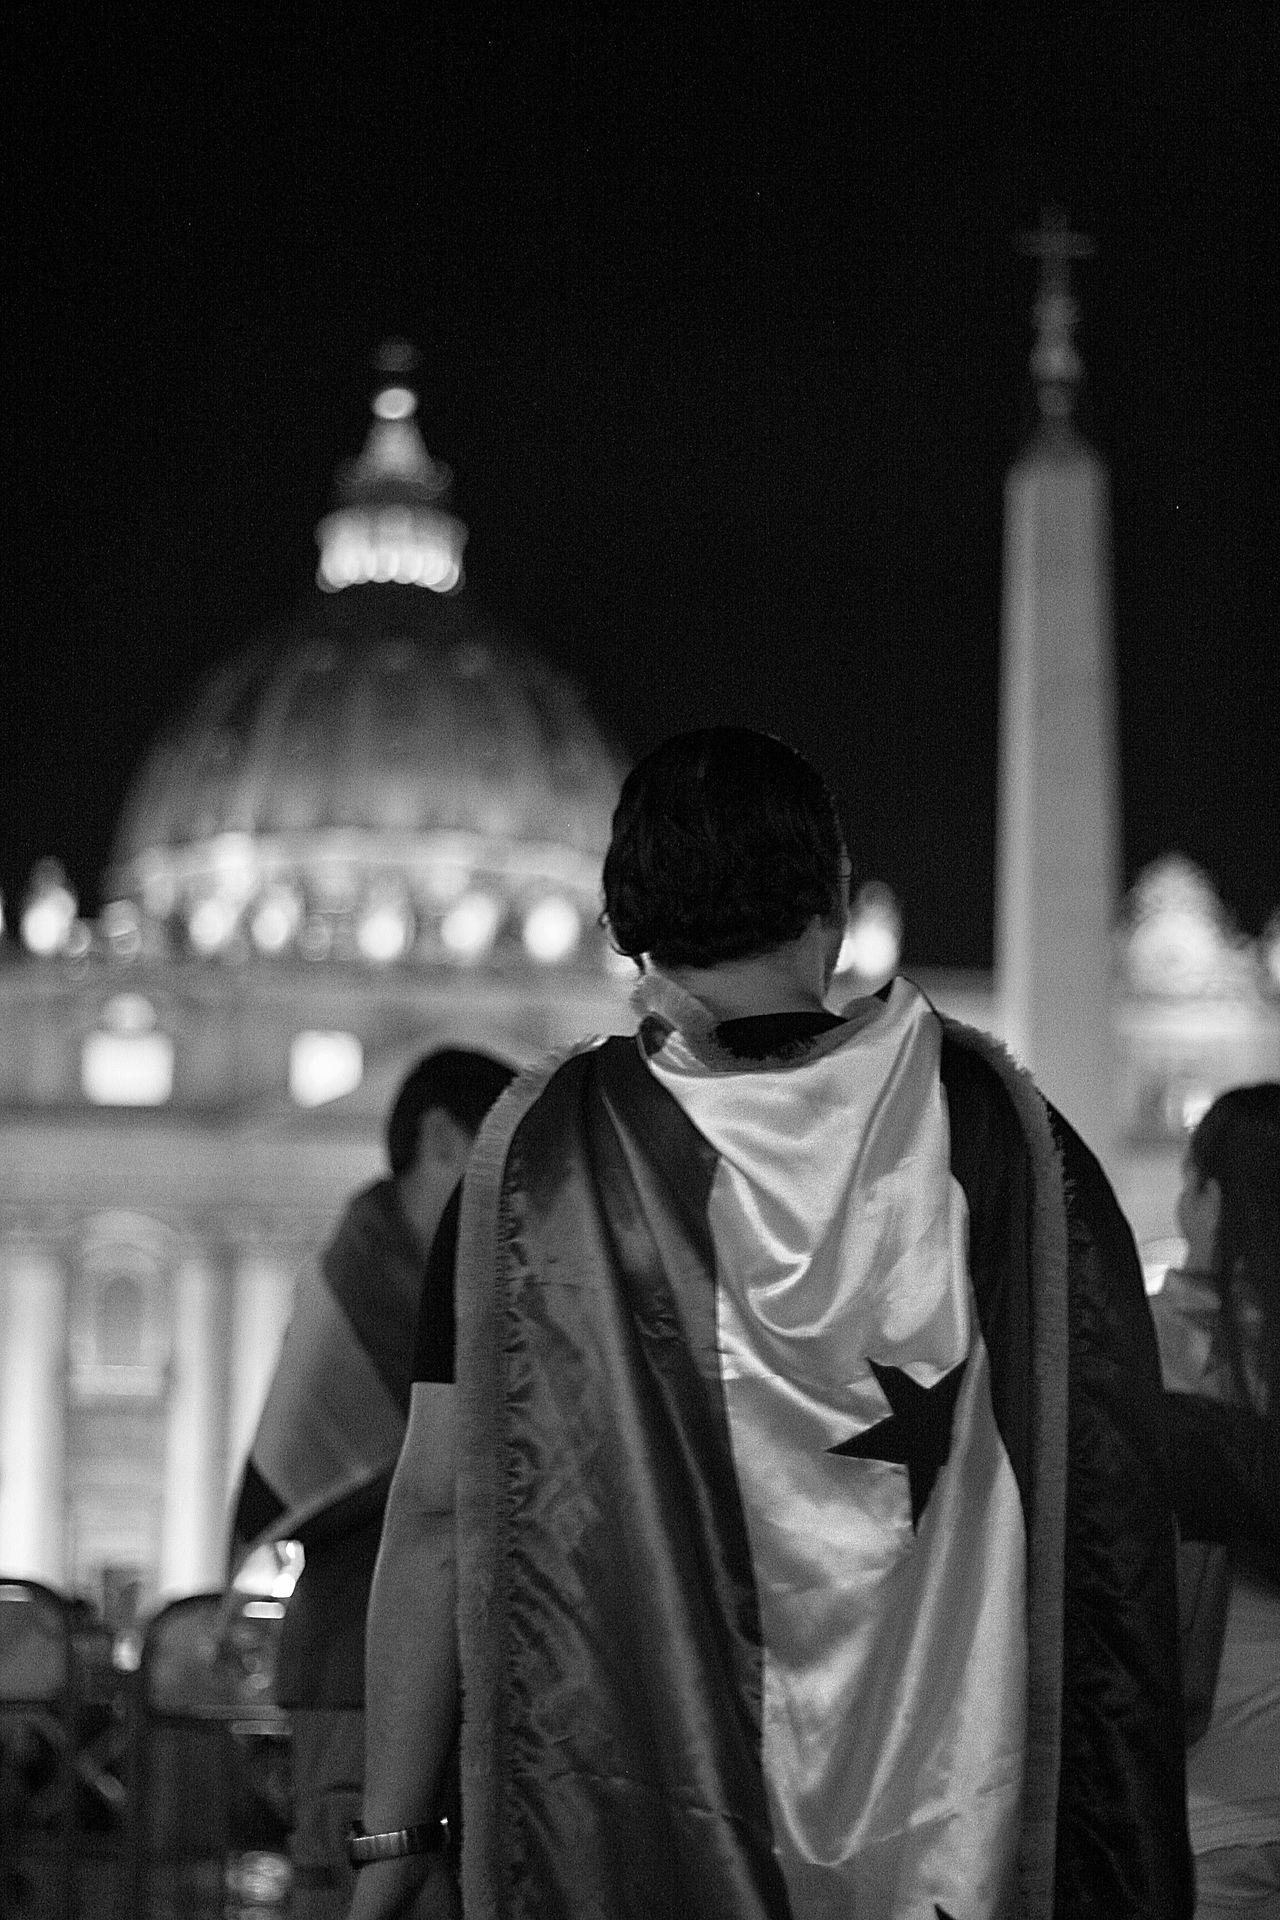 Blackandwhite Monochromatic Monochrome Black & White Jesus Christ Jesus Peace Vatican Vaticano Black And White B&w Street Photography